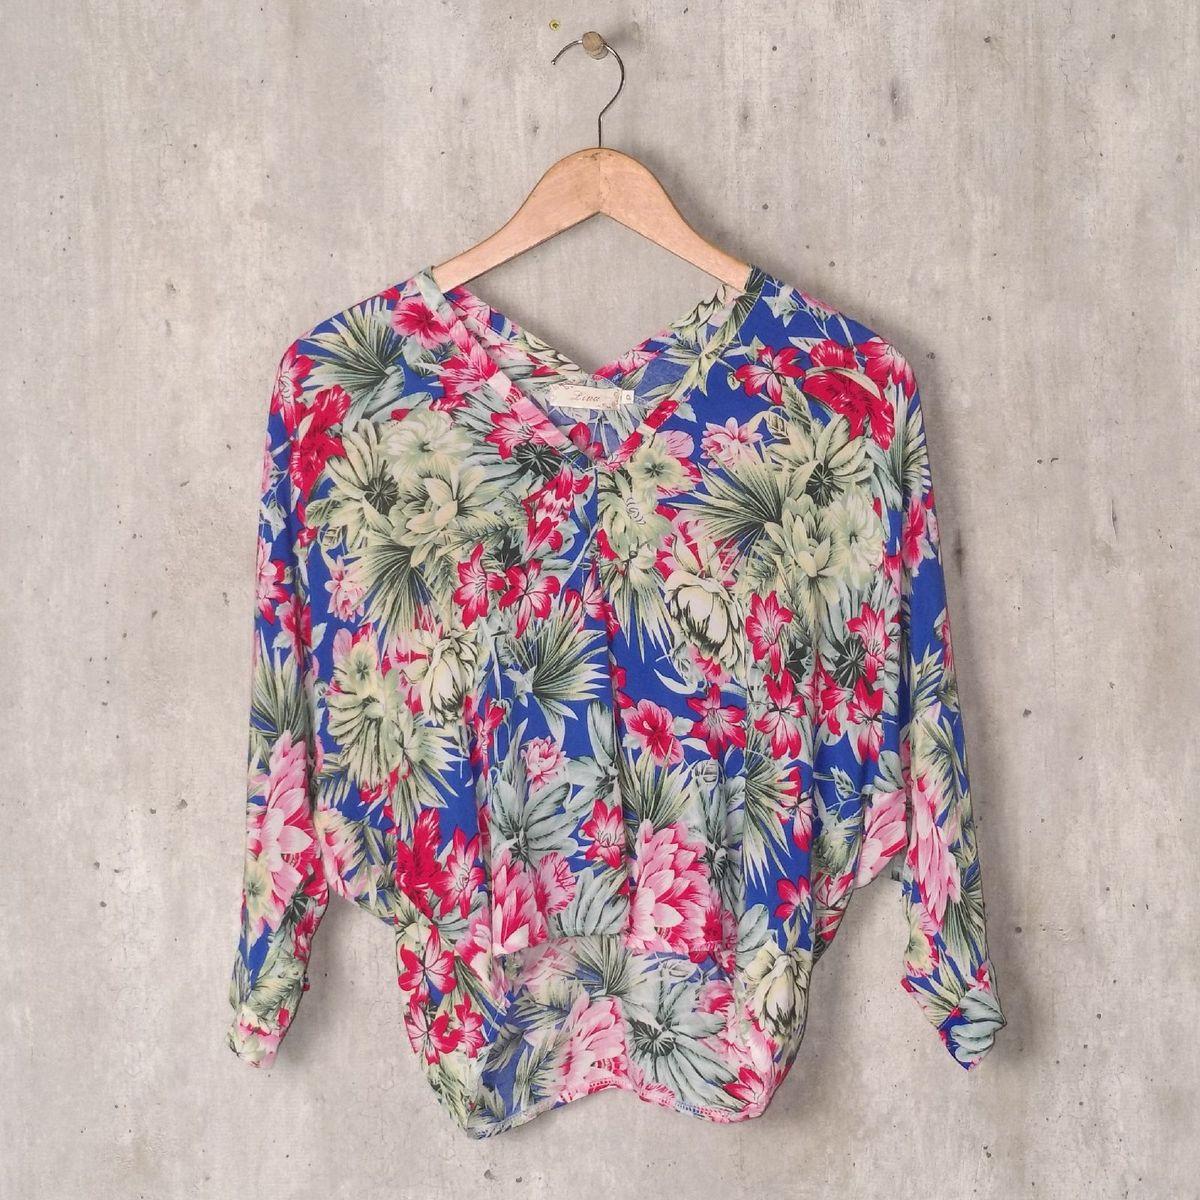 blusa azul floral - blusas lina